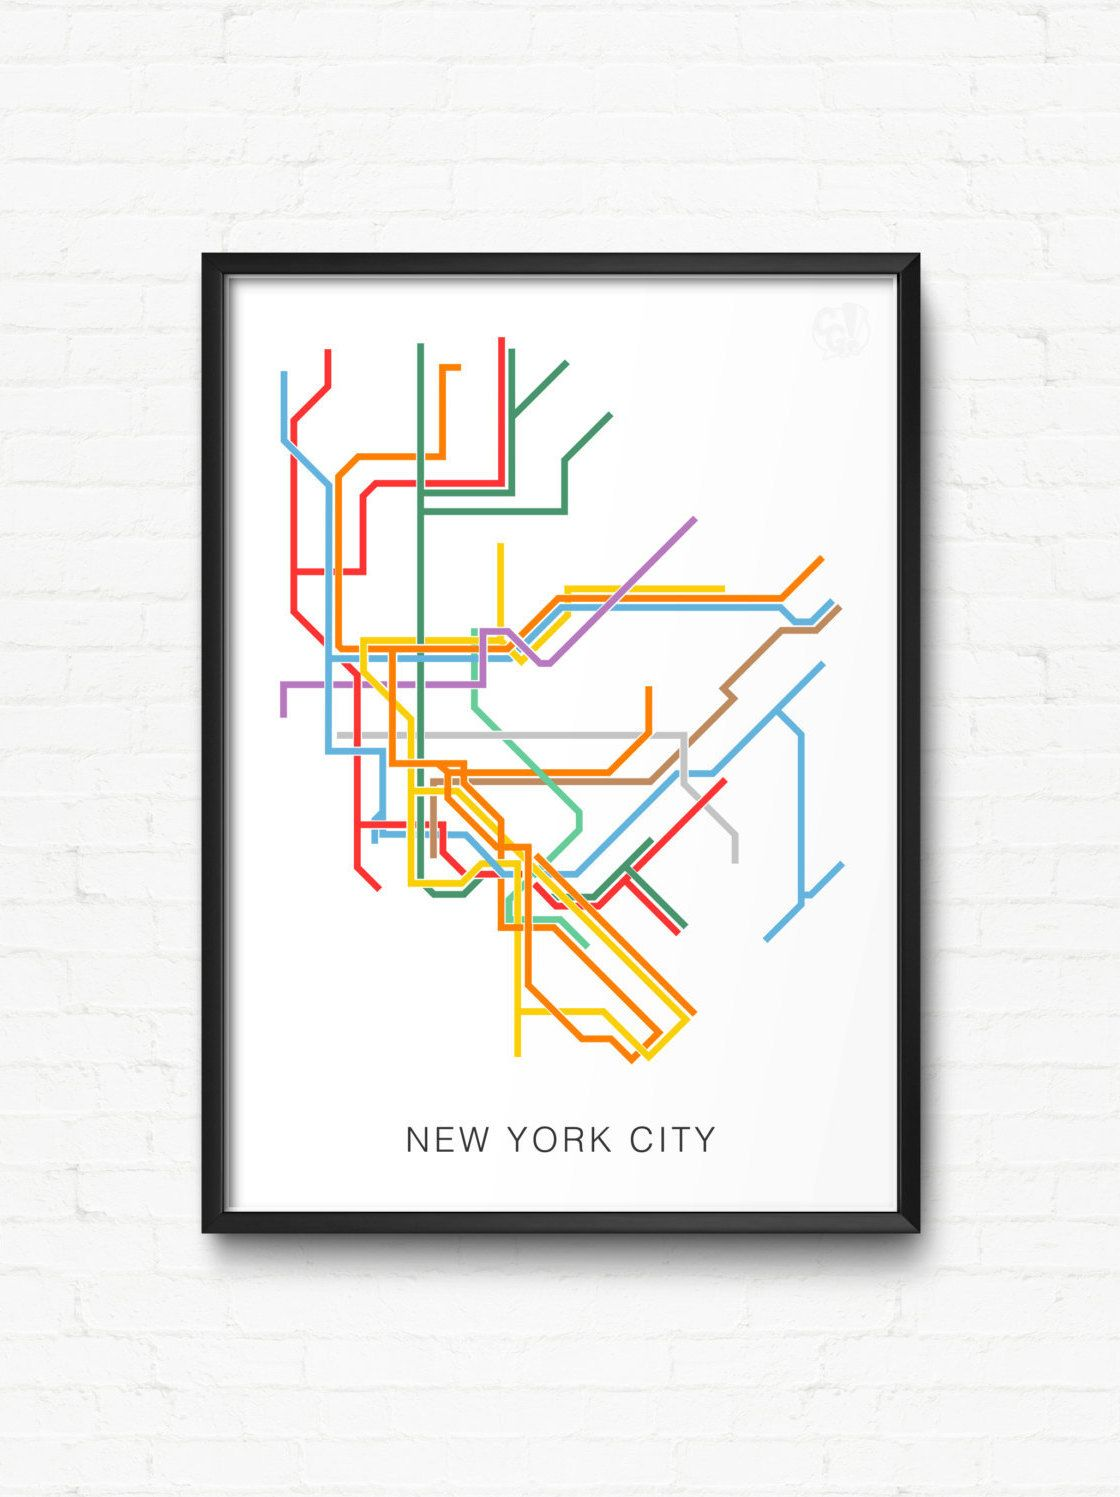 New York City Subway Map City Transit Map Print NYC Metro Map - Nyc map to print